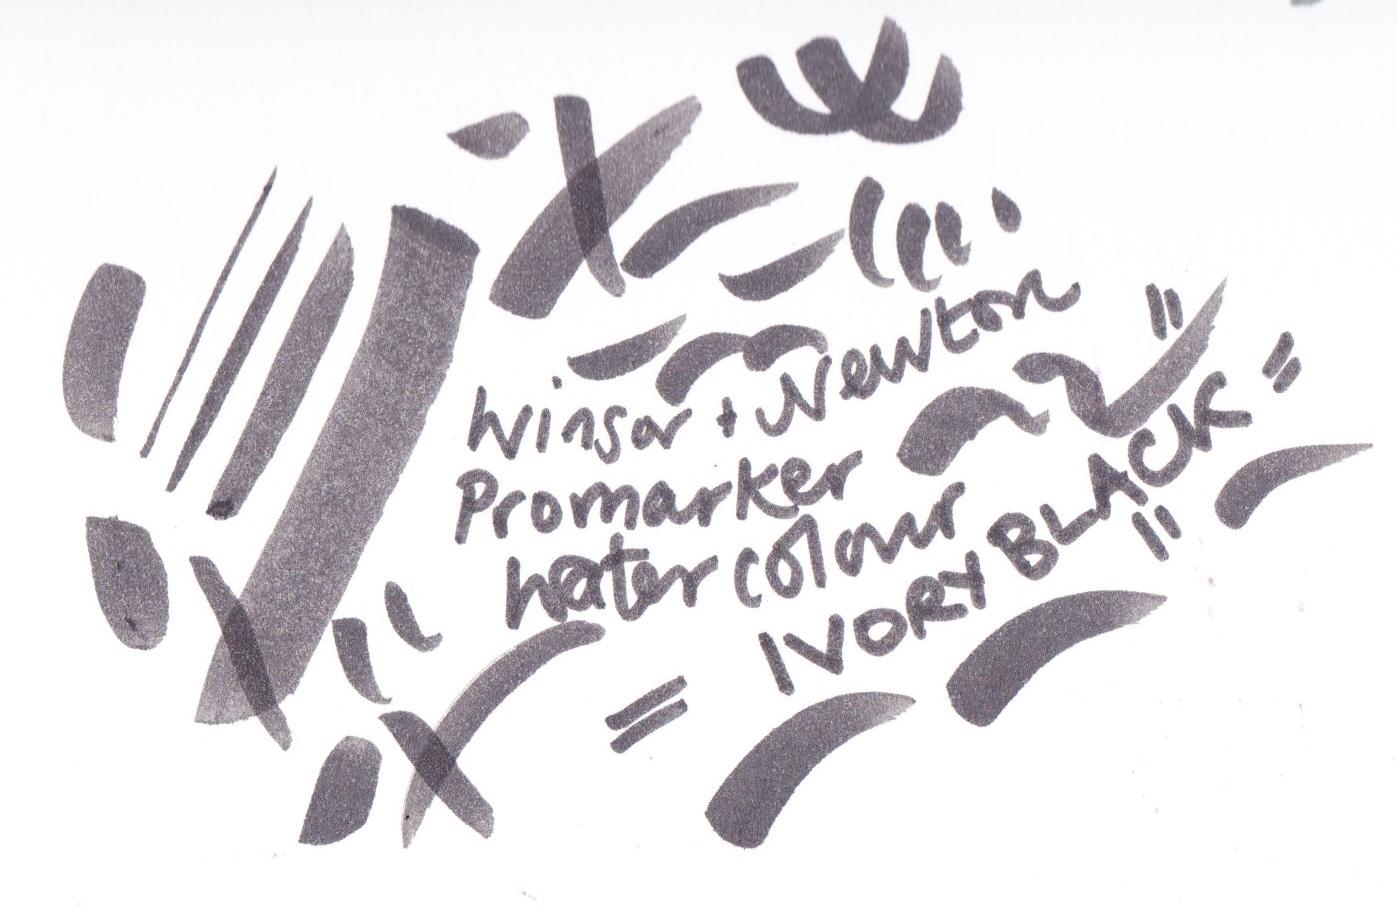 Winsor and Newton Promarker Watercolour Ivory Black on Bristol board